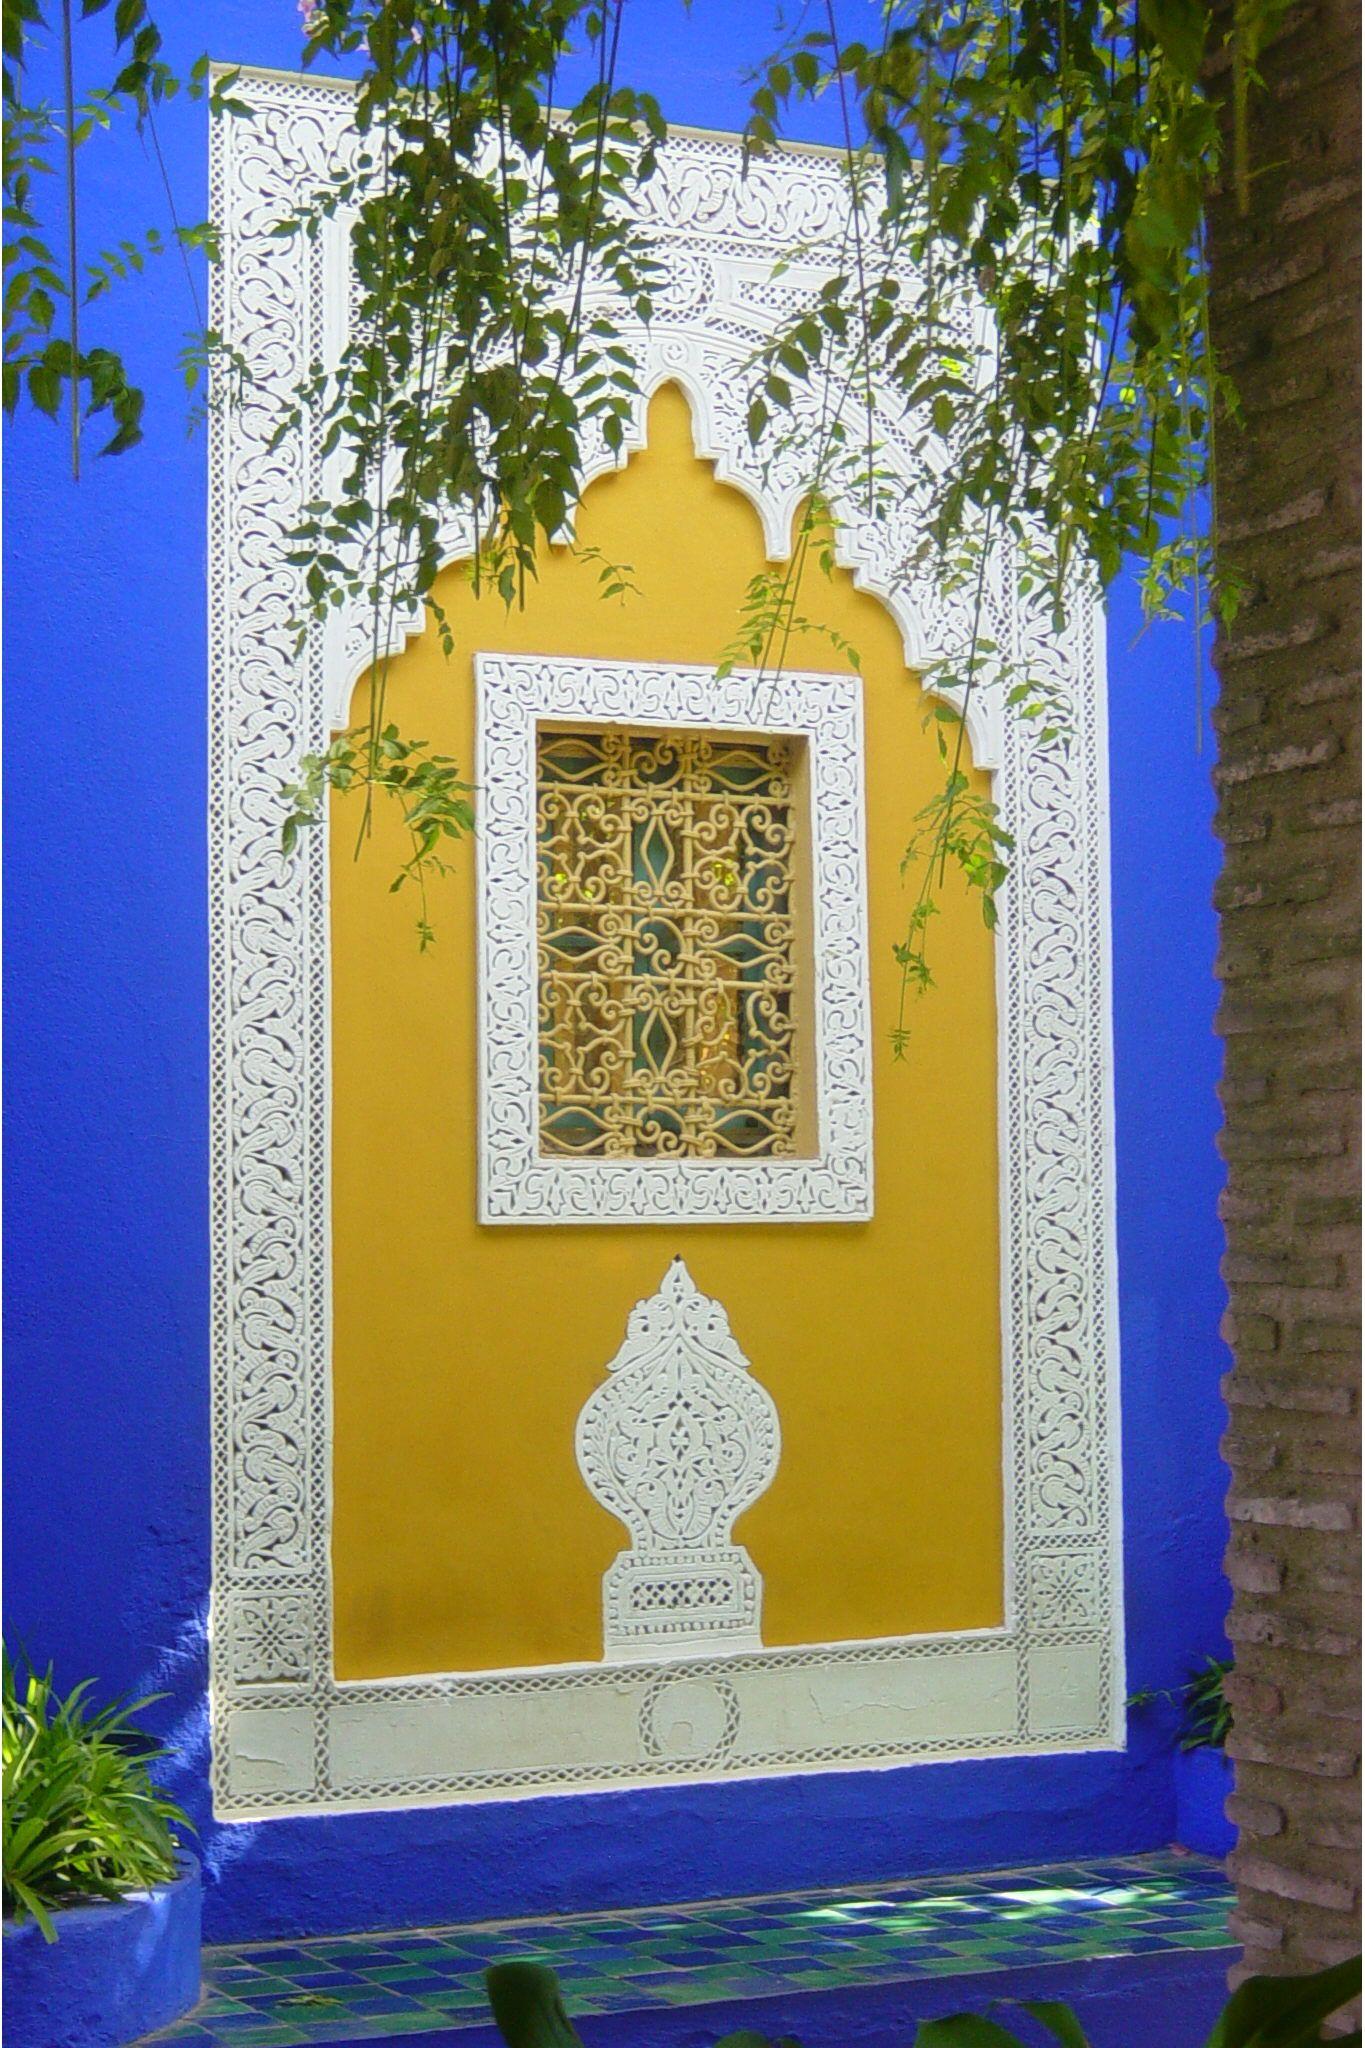 Jardin Majorelle Marruecos Morocco Entrance Doors Doors Entrance